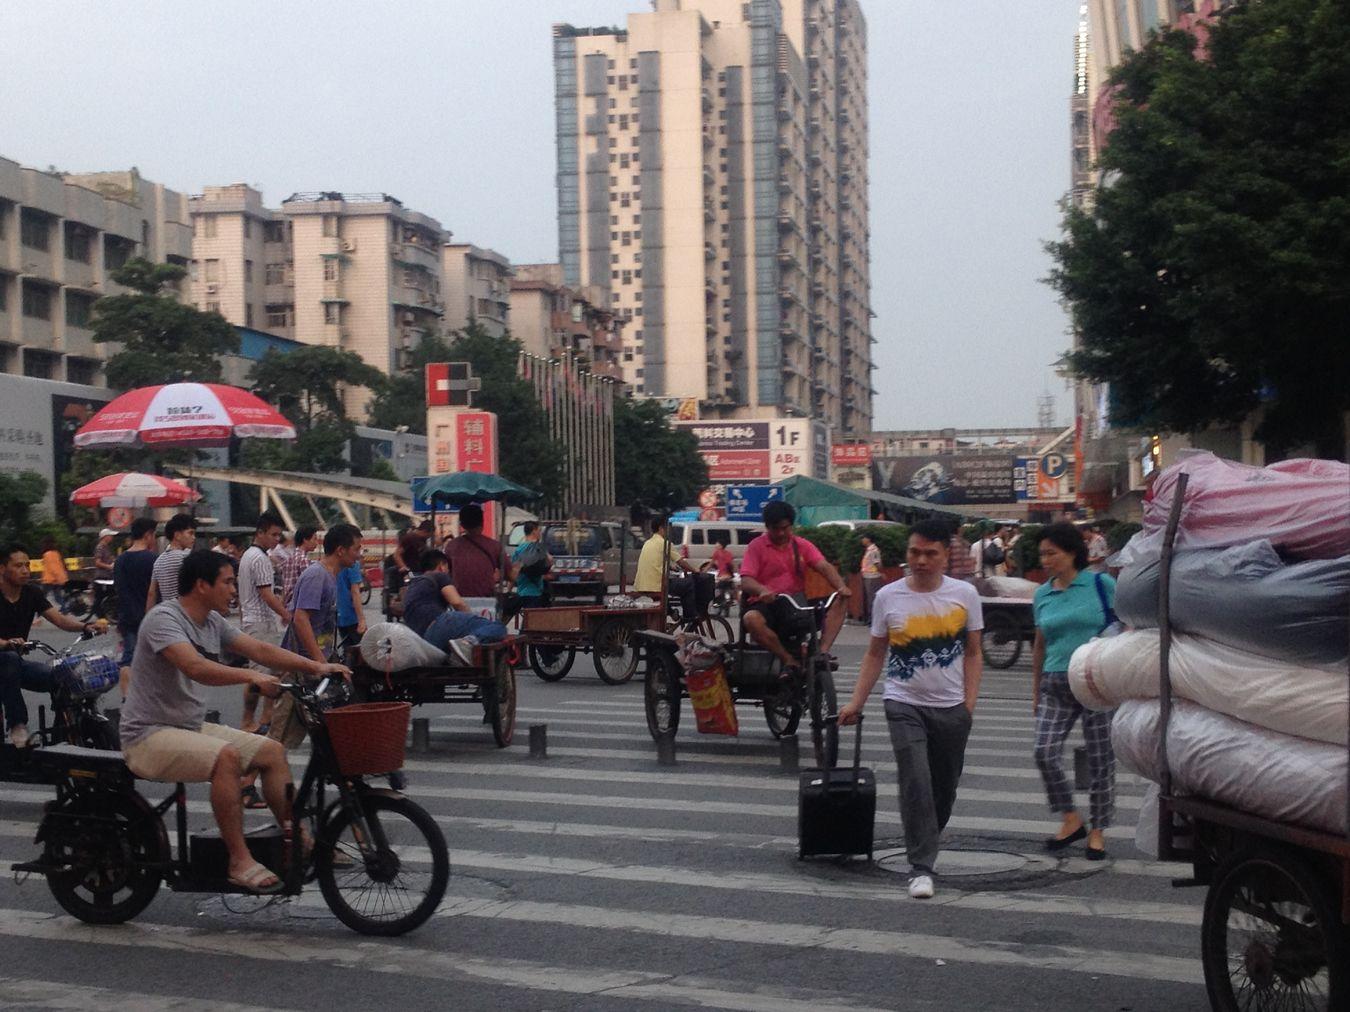 China Road Guangzhou Crosswalk 信号無視